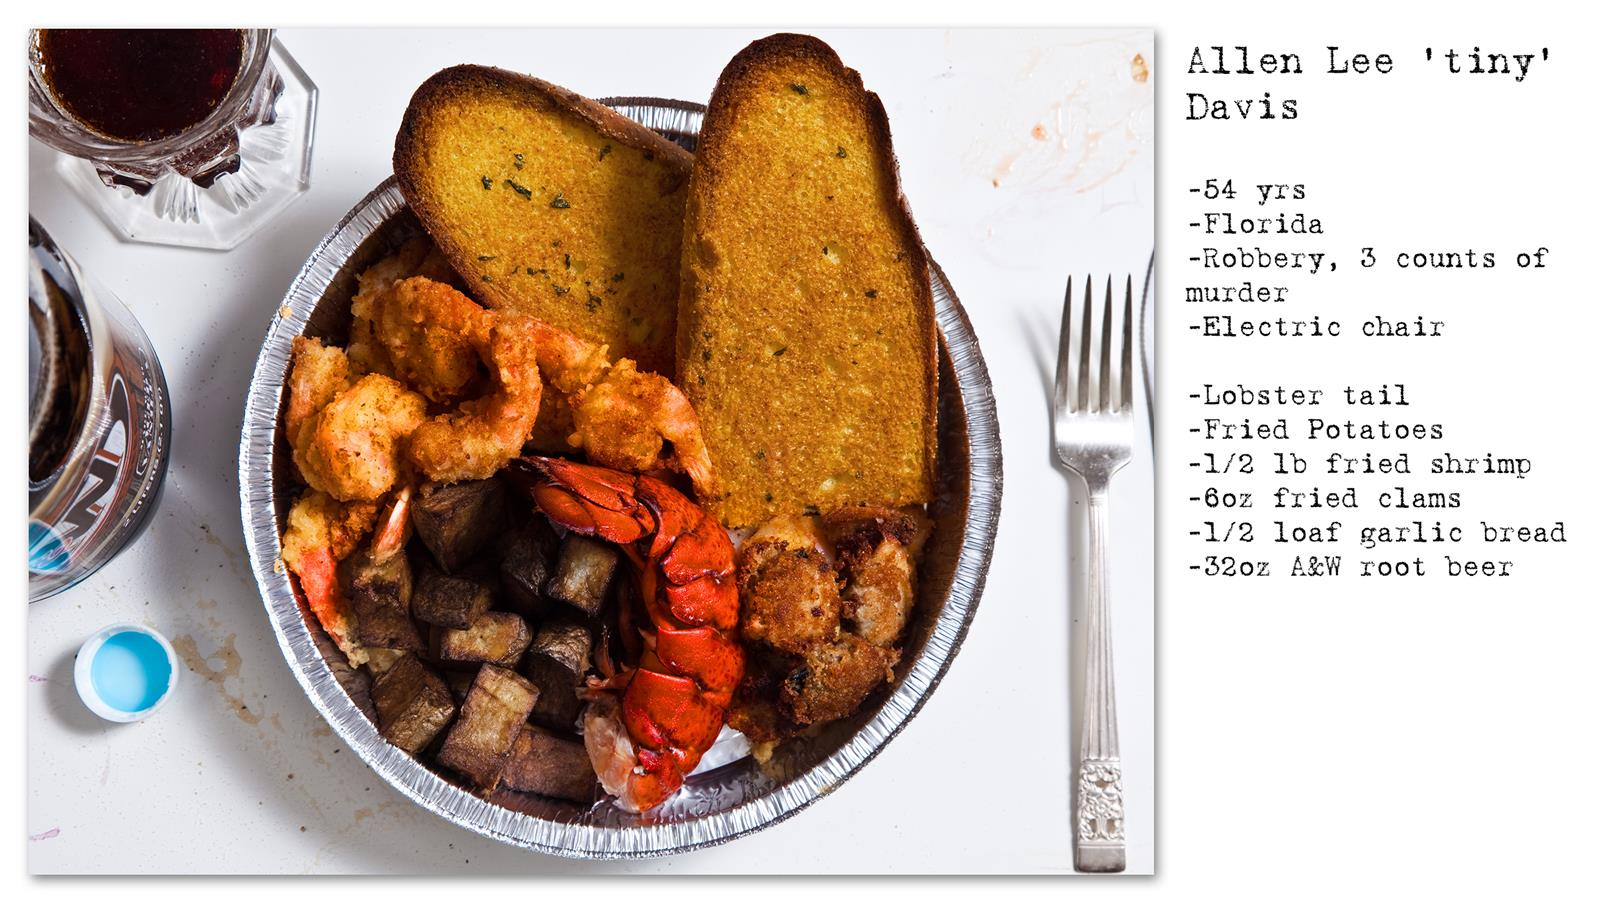 Death Row Prisoner's Last Meal (11)